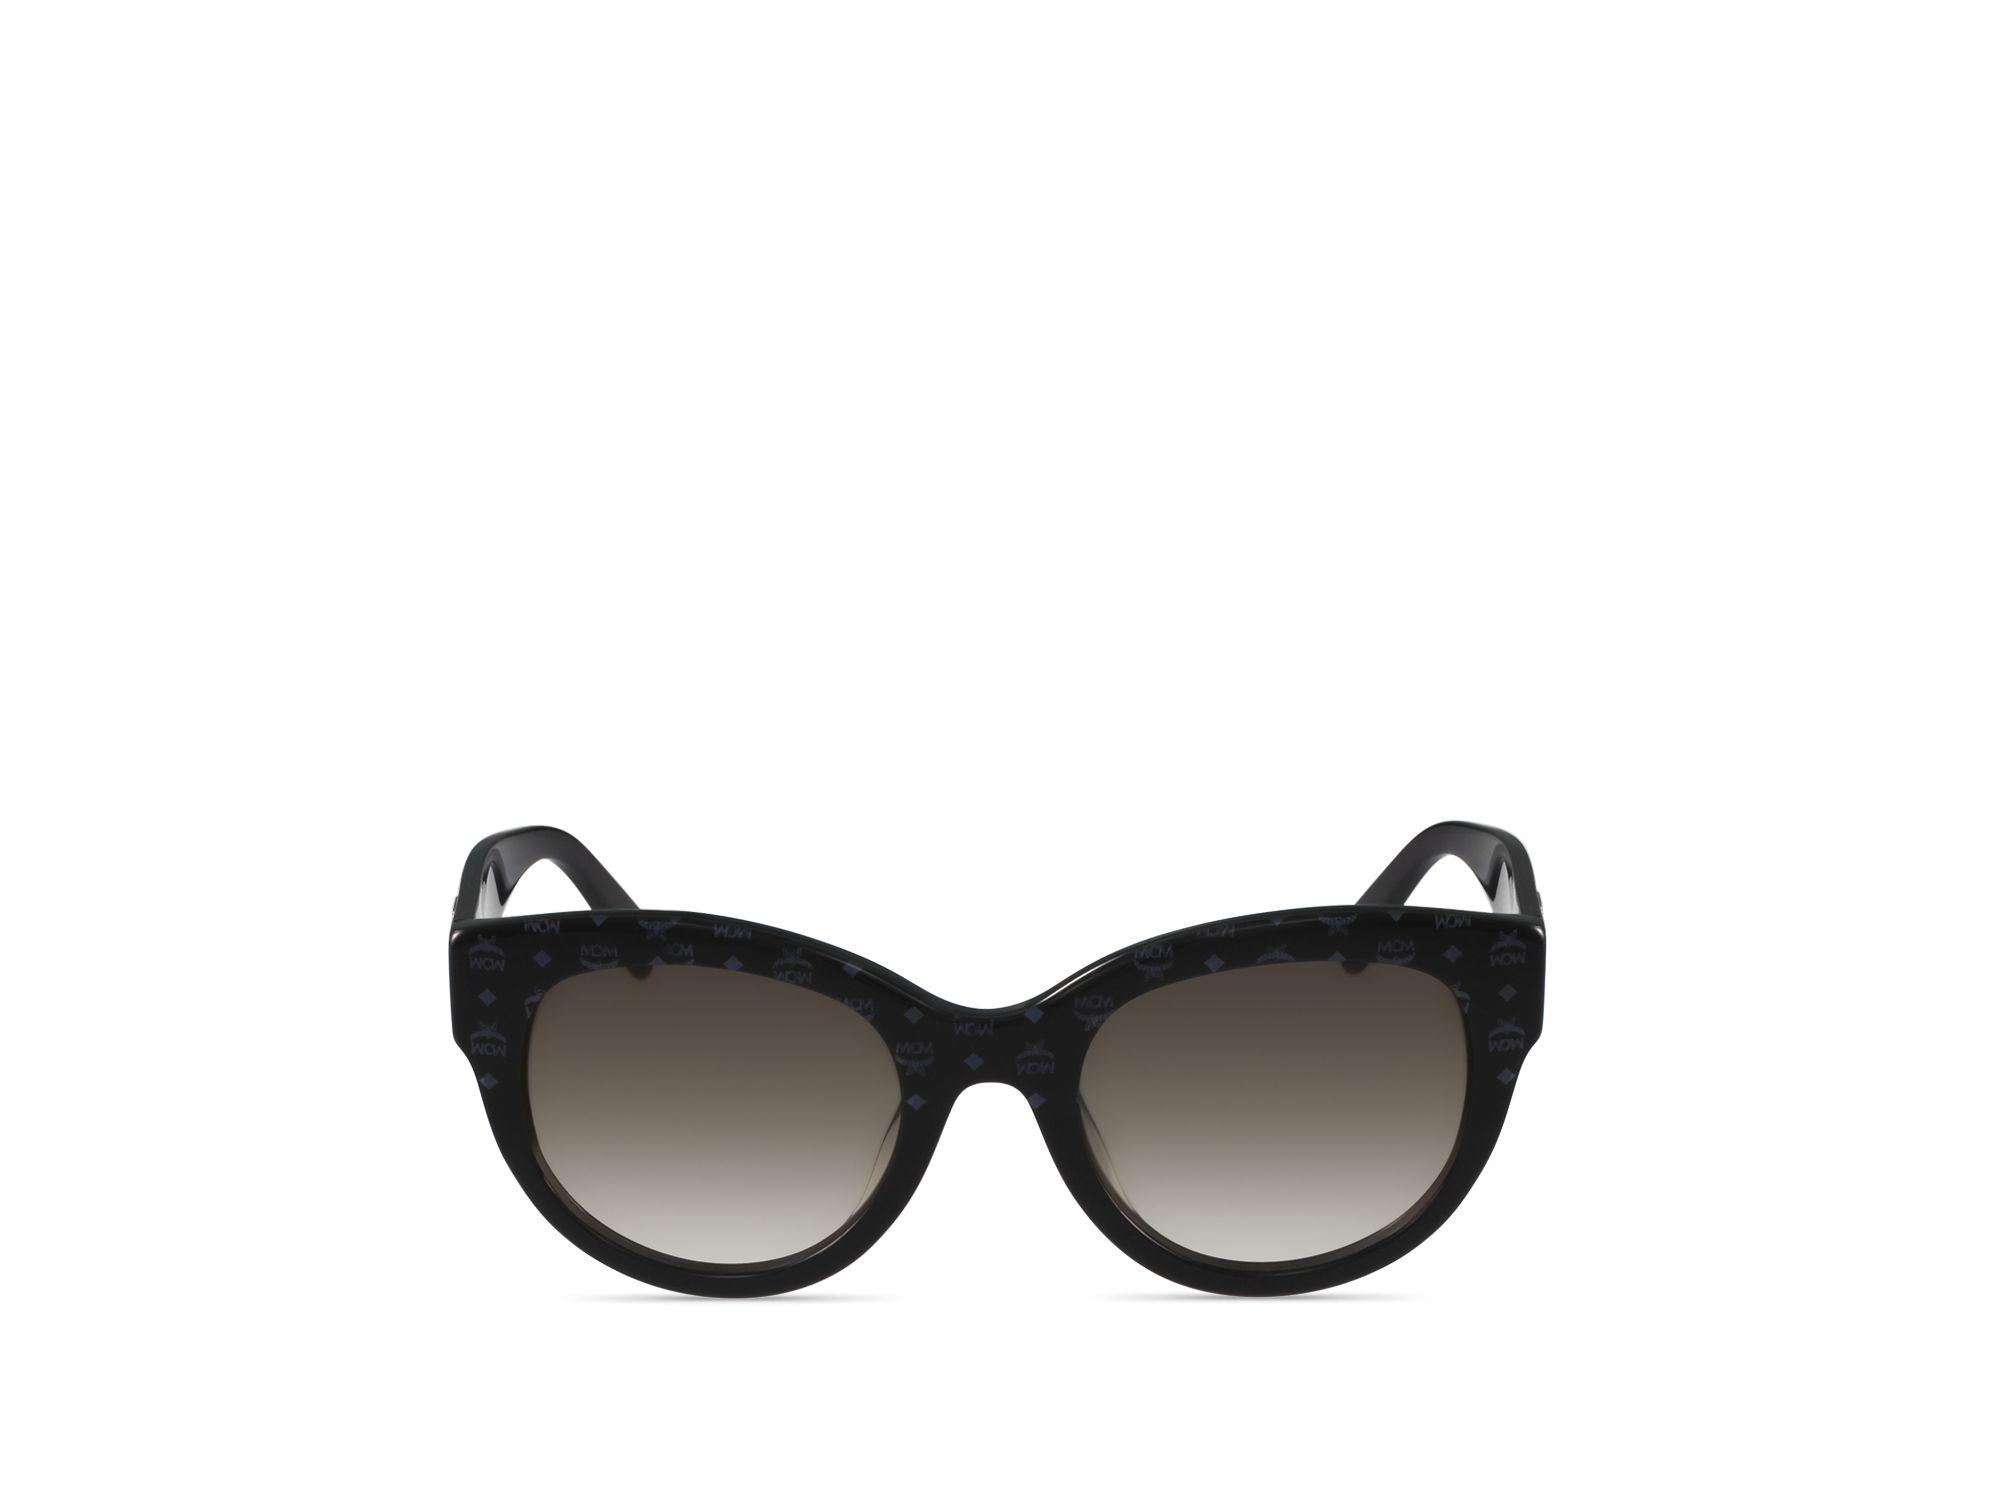 2083b6145cd mcm-black-visetosgray-gradient-lens-cateye-sunglasses -black-product-0-130239664-normal.jpeg